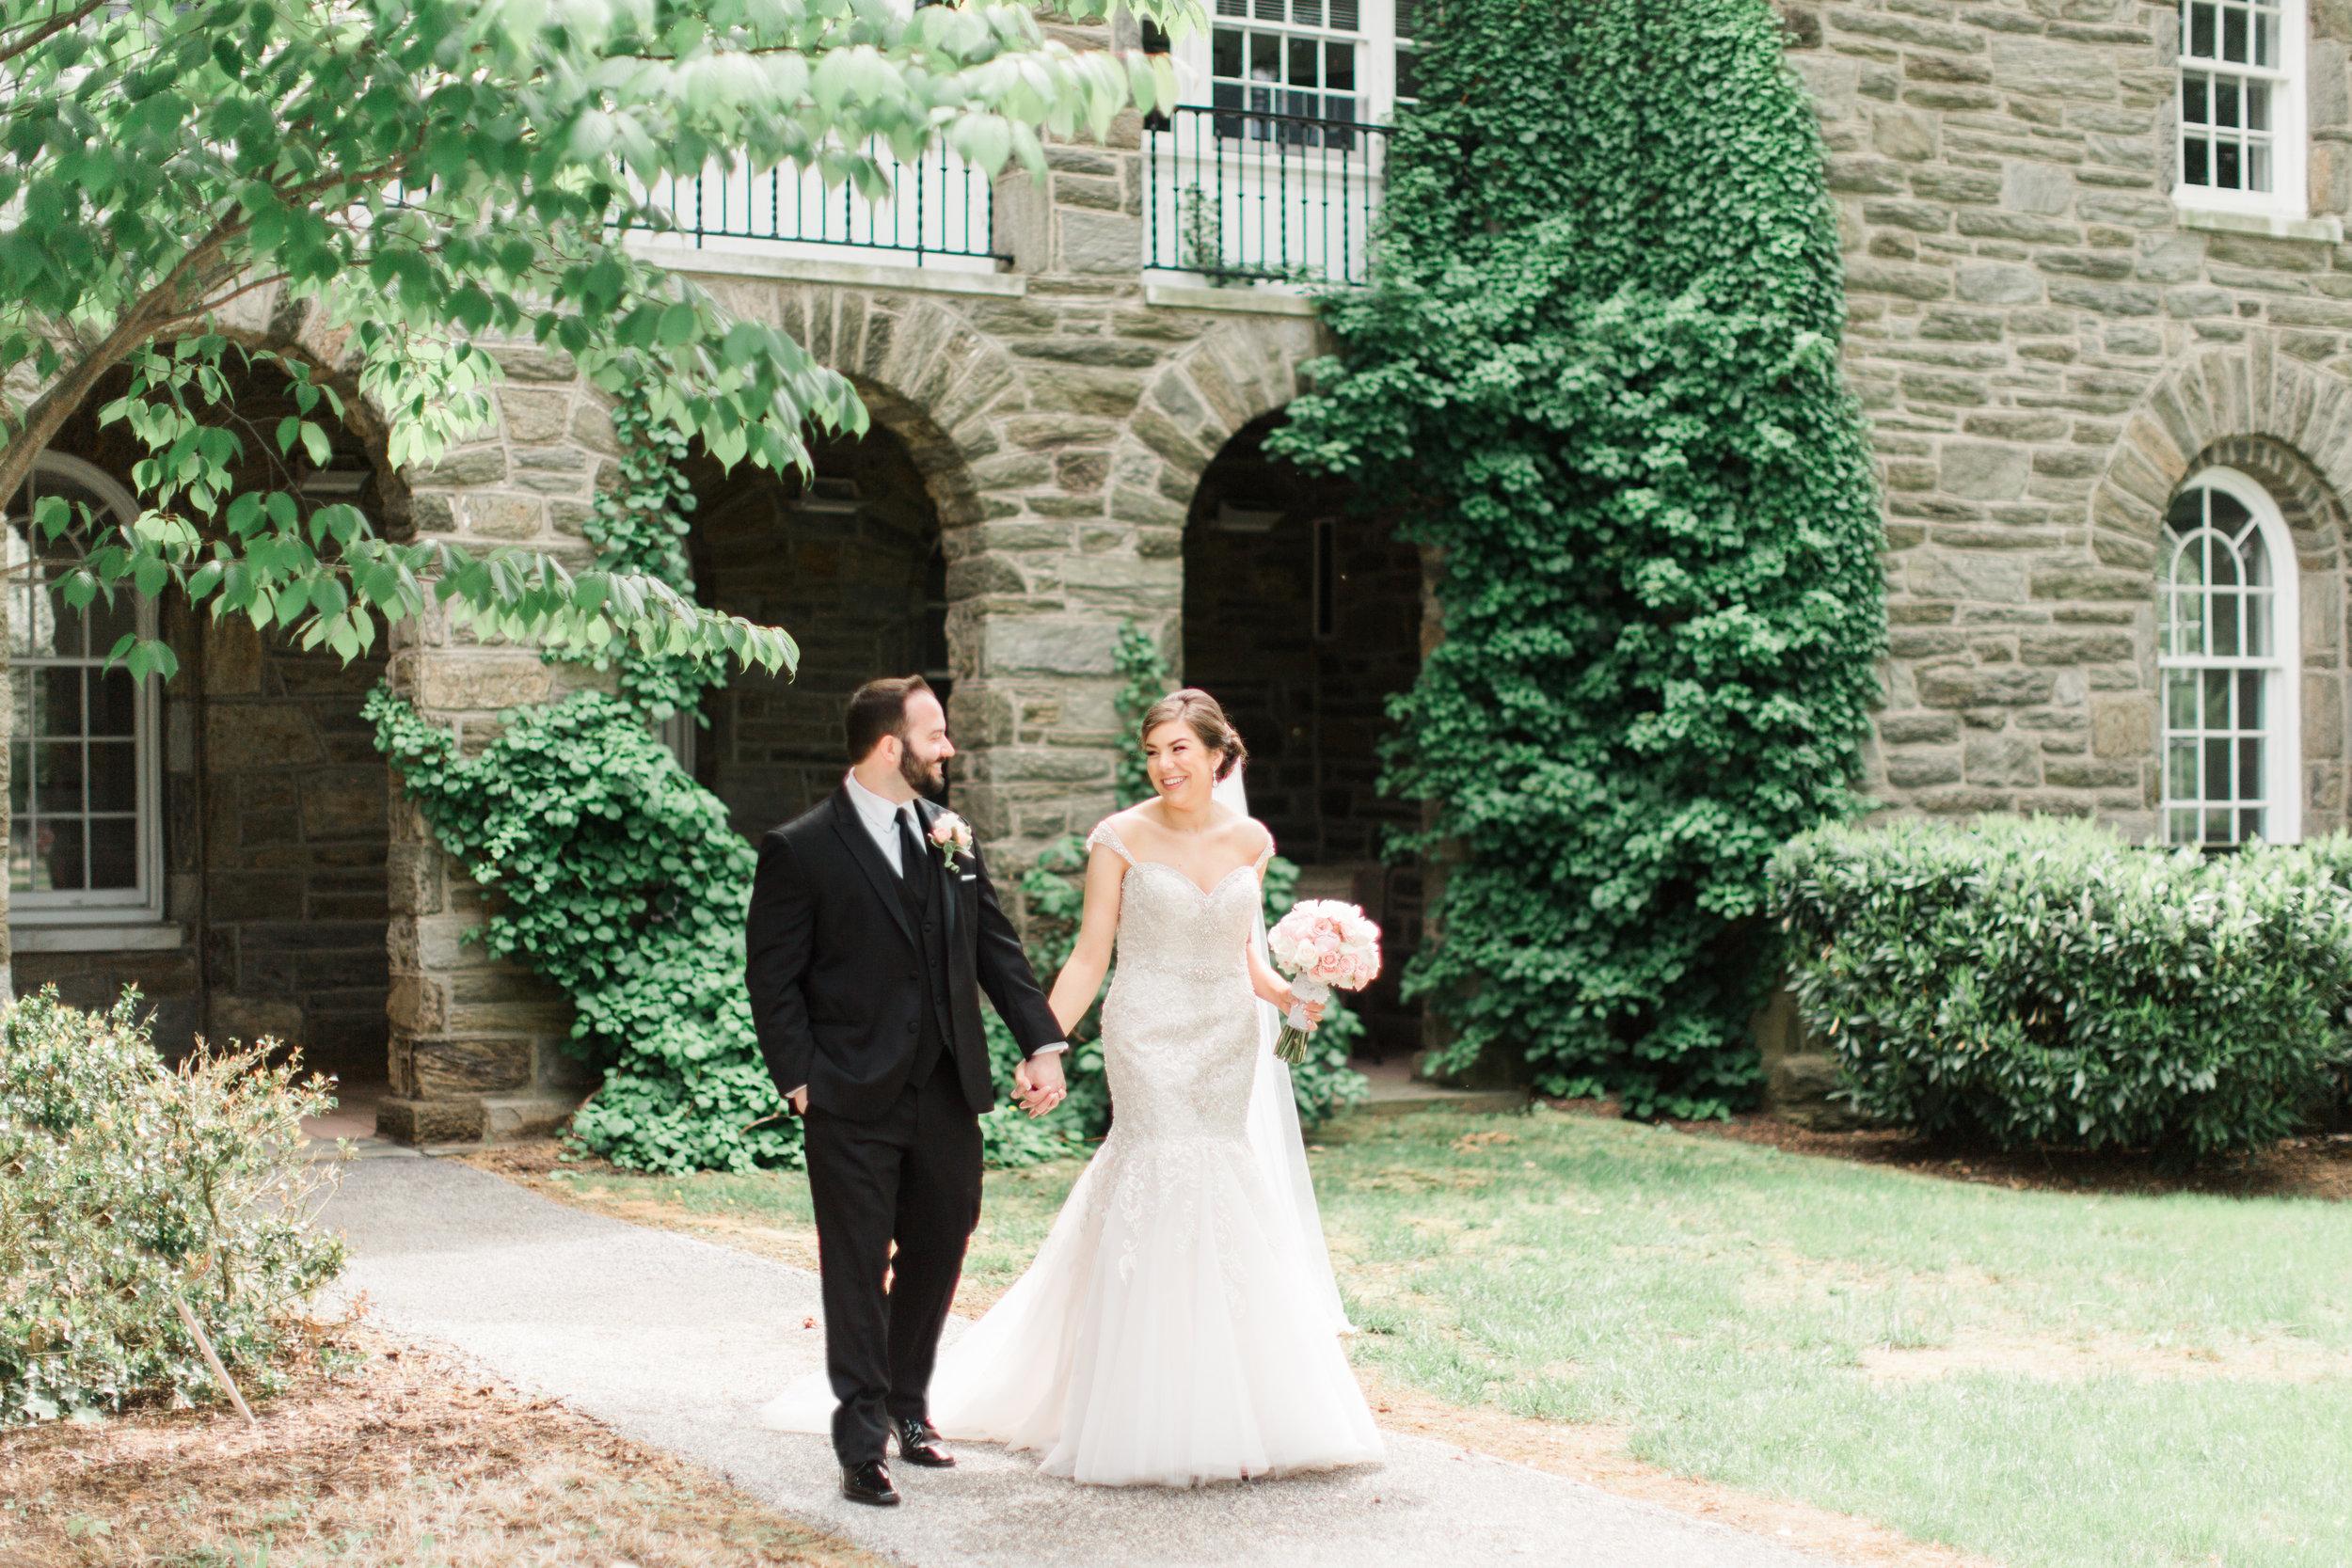 kellyandjoe_wedding (340 of 1296).jpg